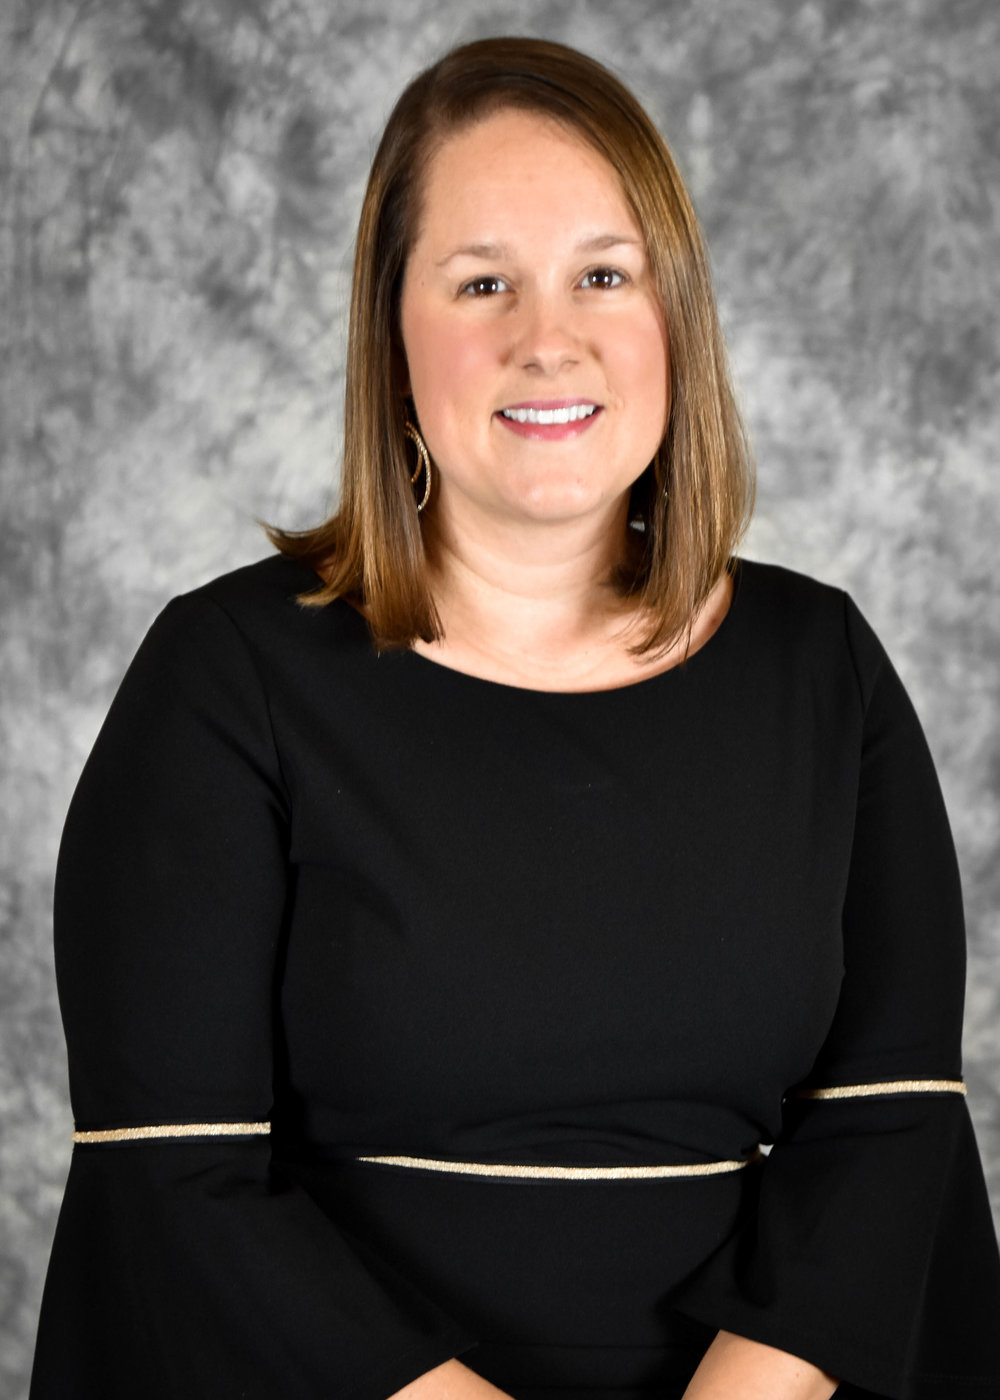 Lauren Livermore, P.E., BCEE, Managing Engineer